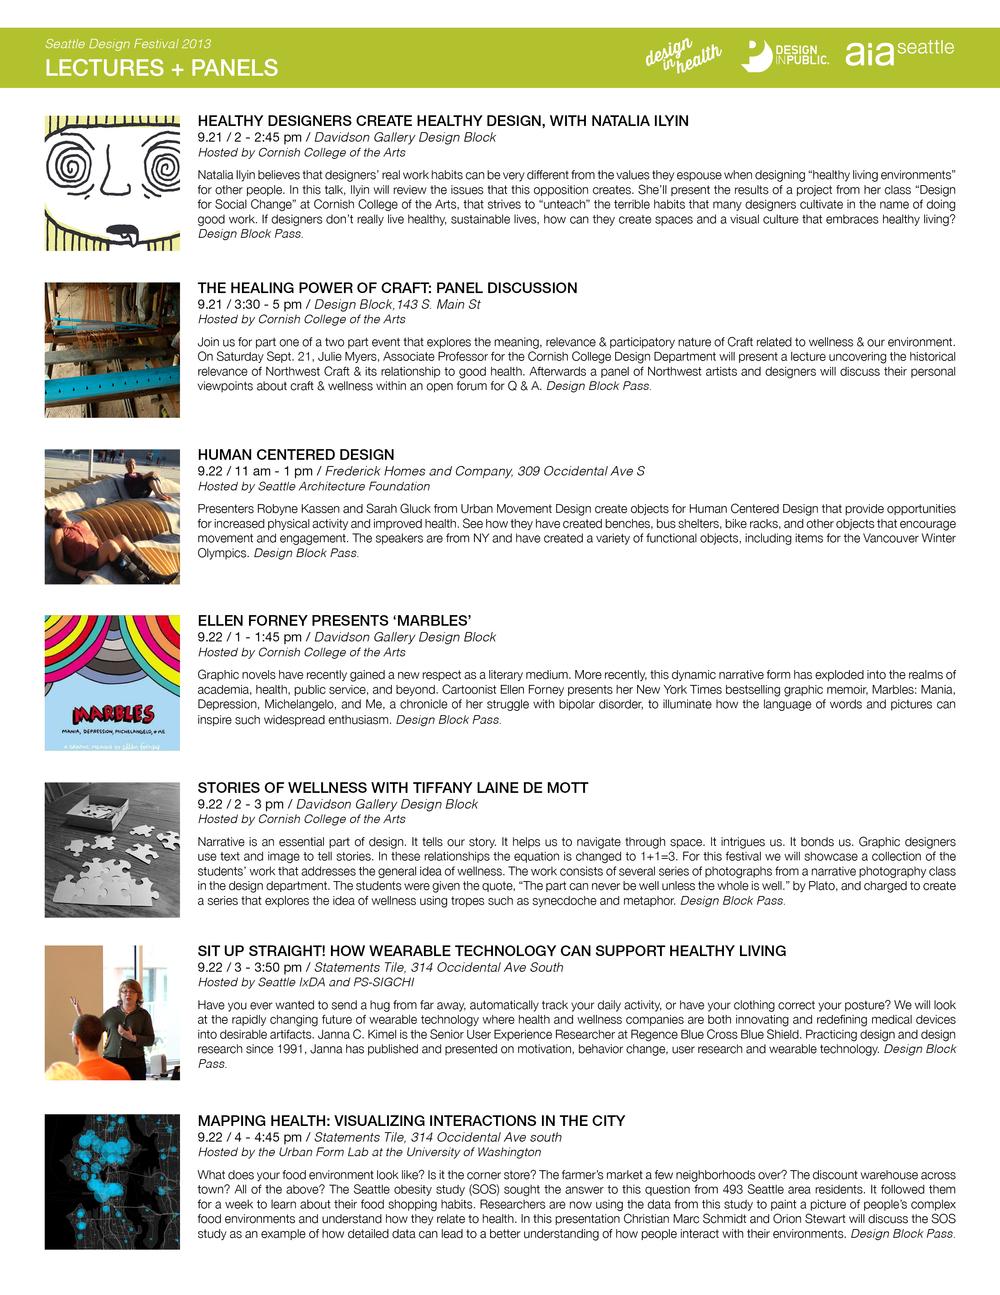 SDF13_festival program_of_events_web25.jpg